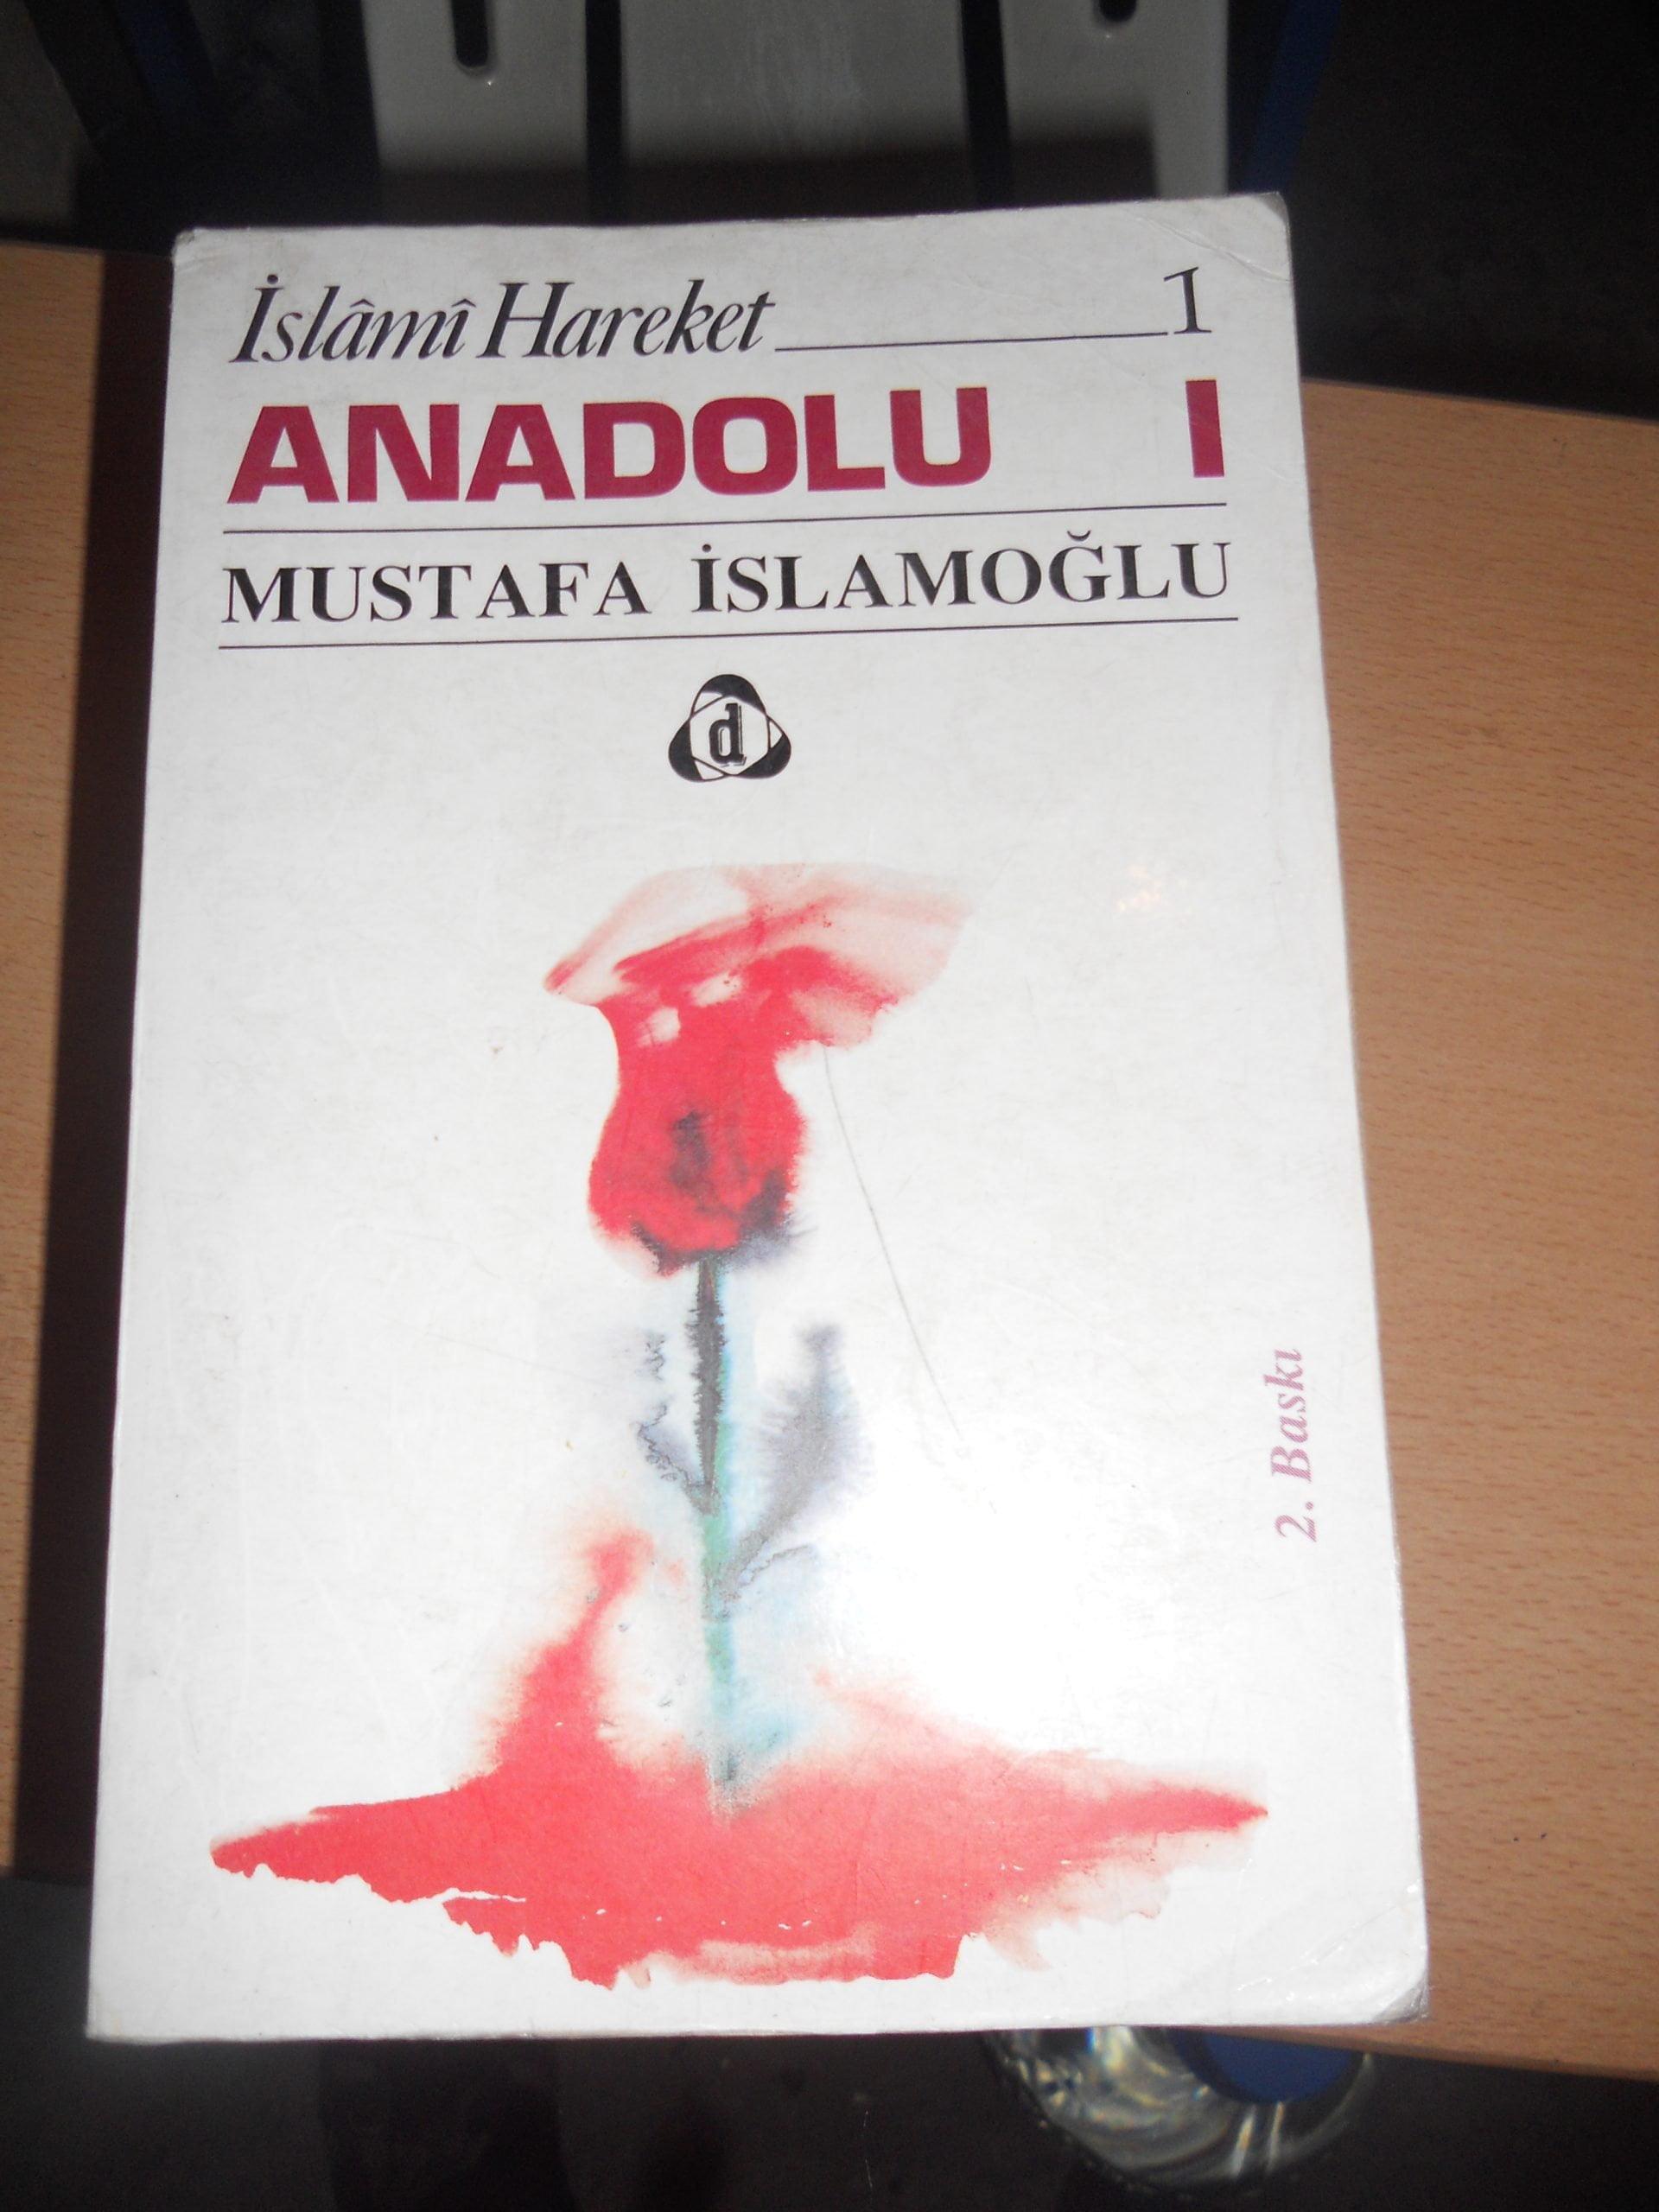 İslami hareket ANADOLU 1/Mustafa İSLAMOĞLU/ 10TL